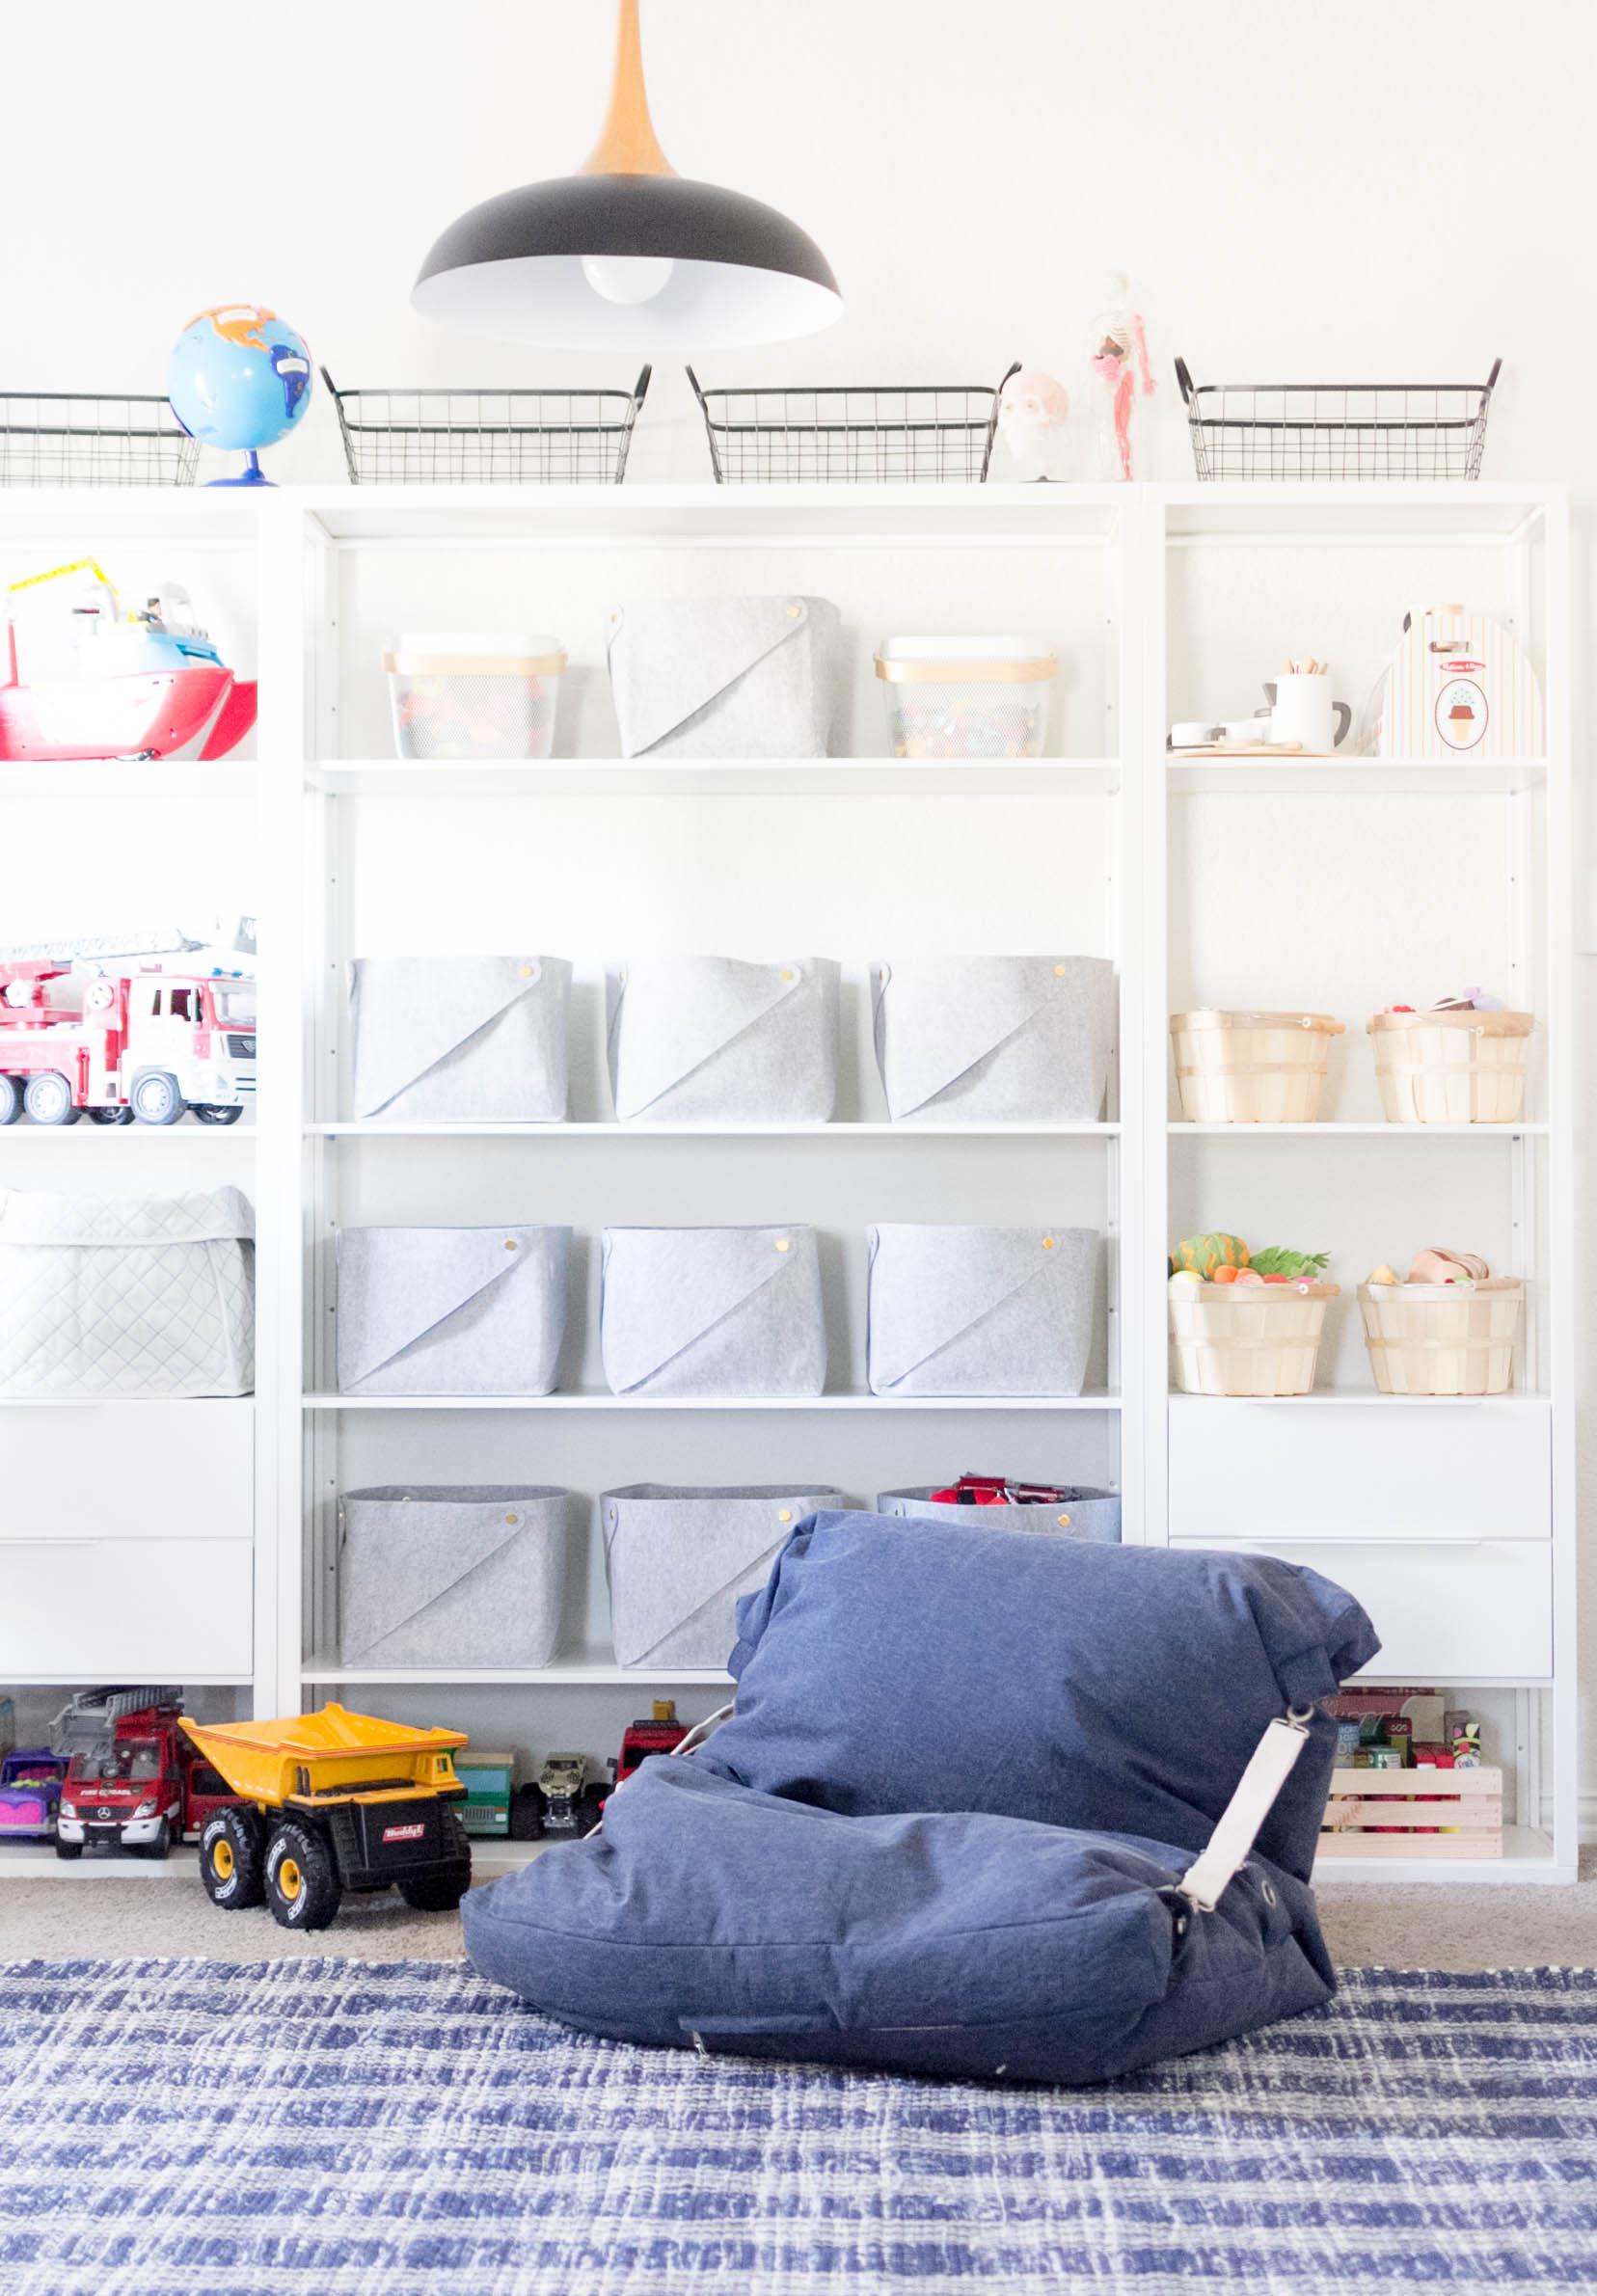 Playroom Organization, Ikea Shelving with Felt Bins, Land of Nod Bean Bag Chair, Makeover by Iris Nacole